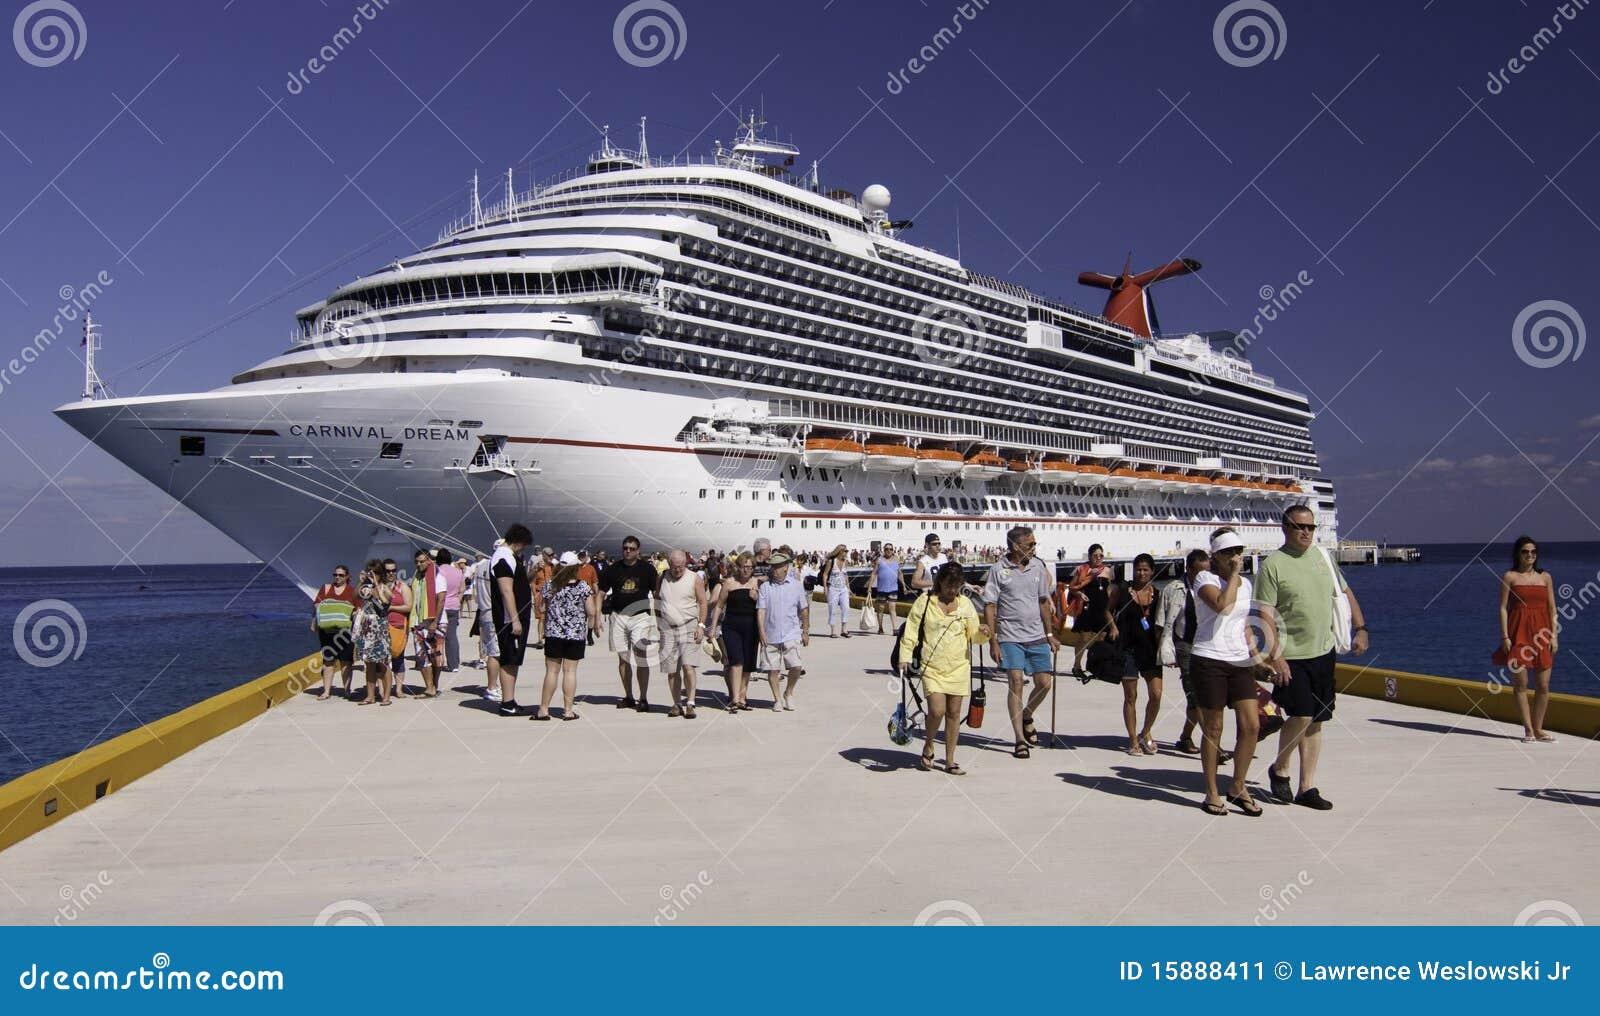 Cruise ship - Carnival Dream in Cozumel